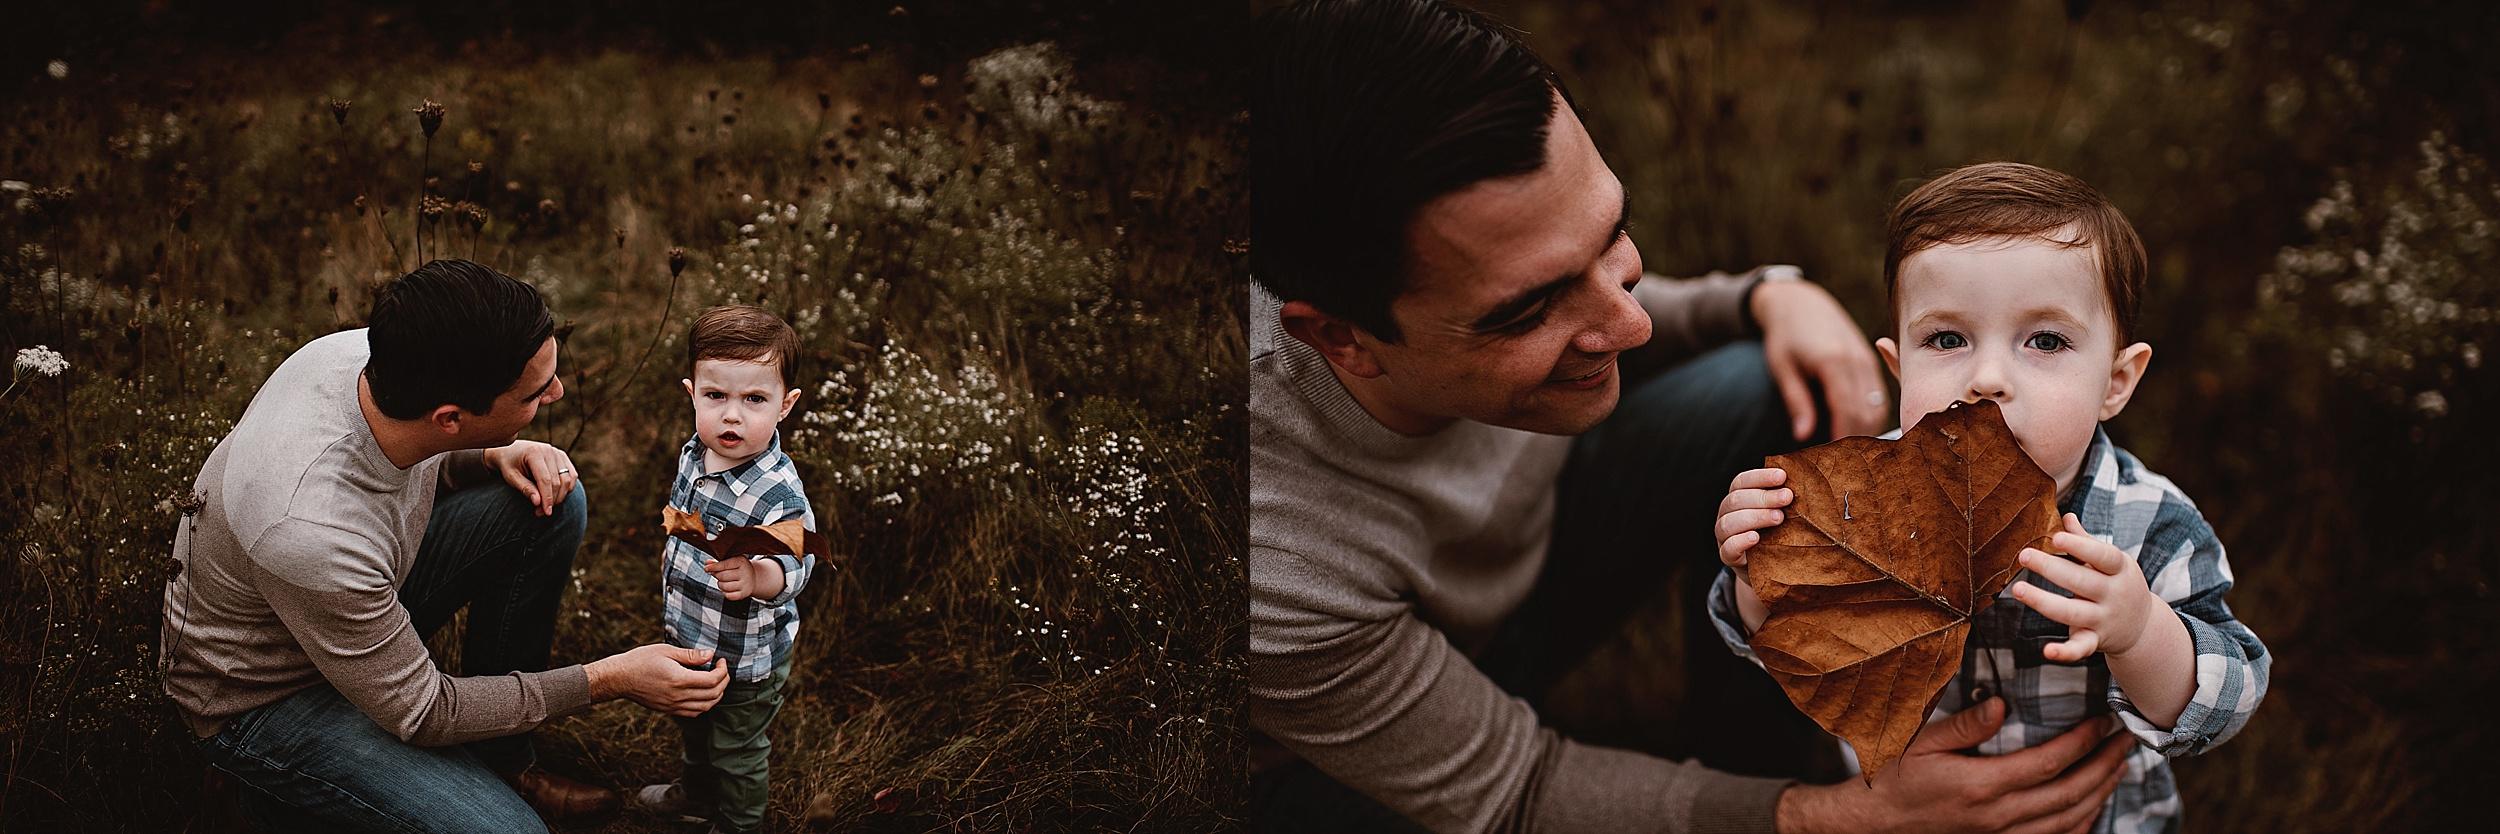 lauren-grayson-photography-portrait-artist-akron-cleveland-ohio-photographer-family-session-fields-sunset-fall_0194.jpg